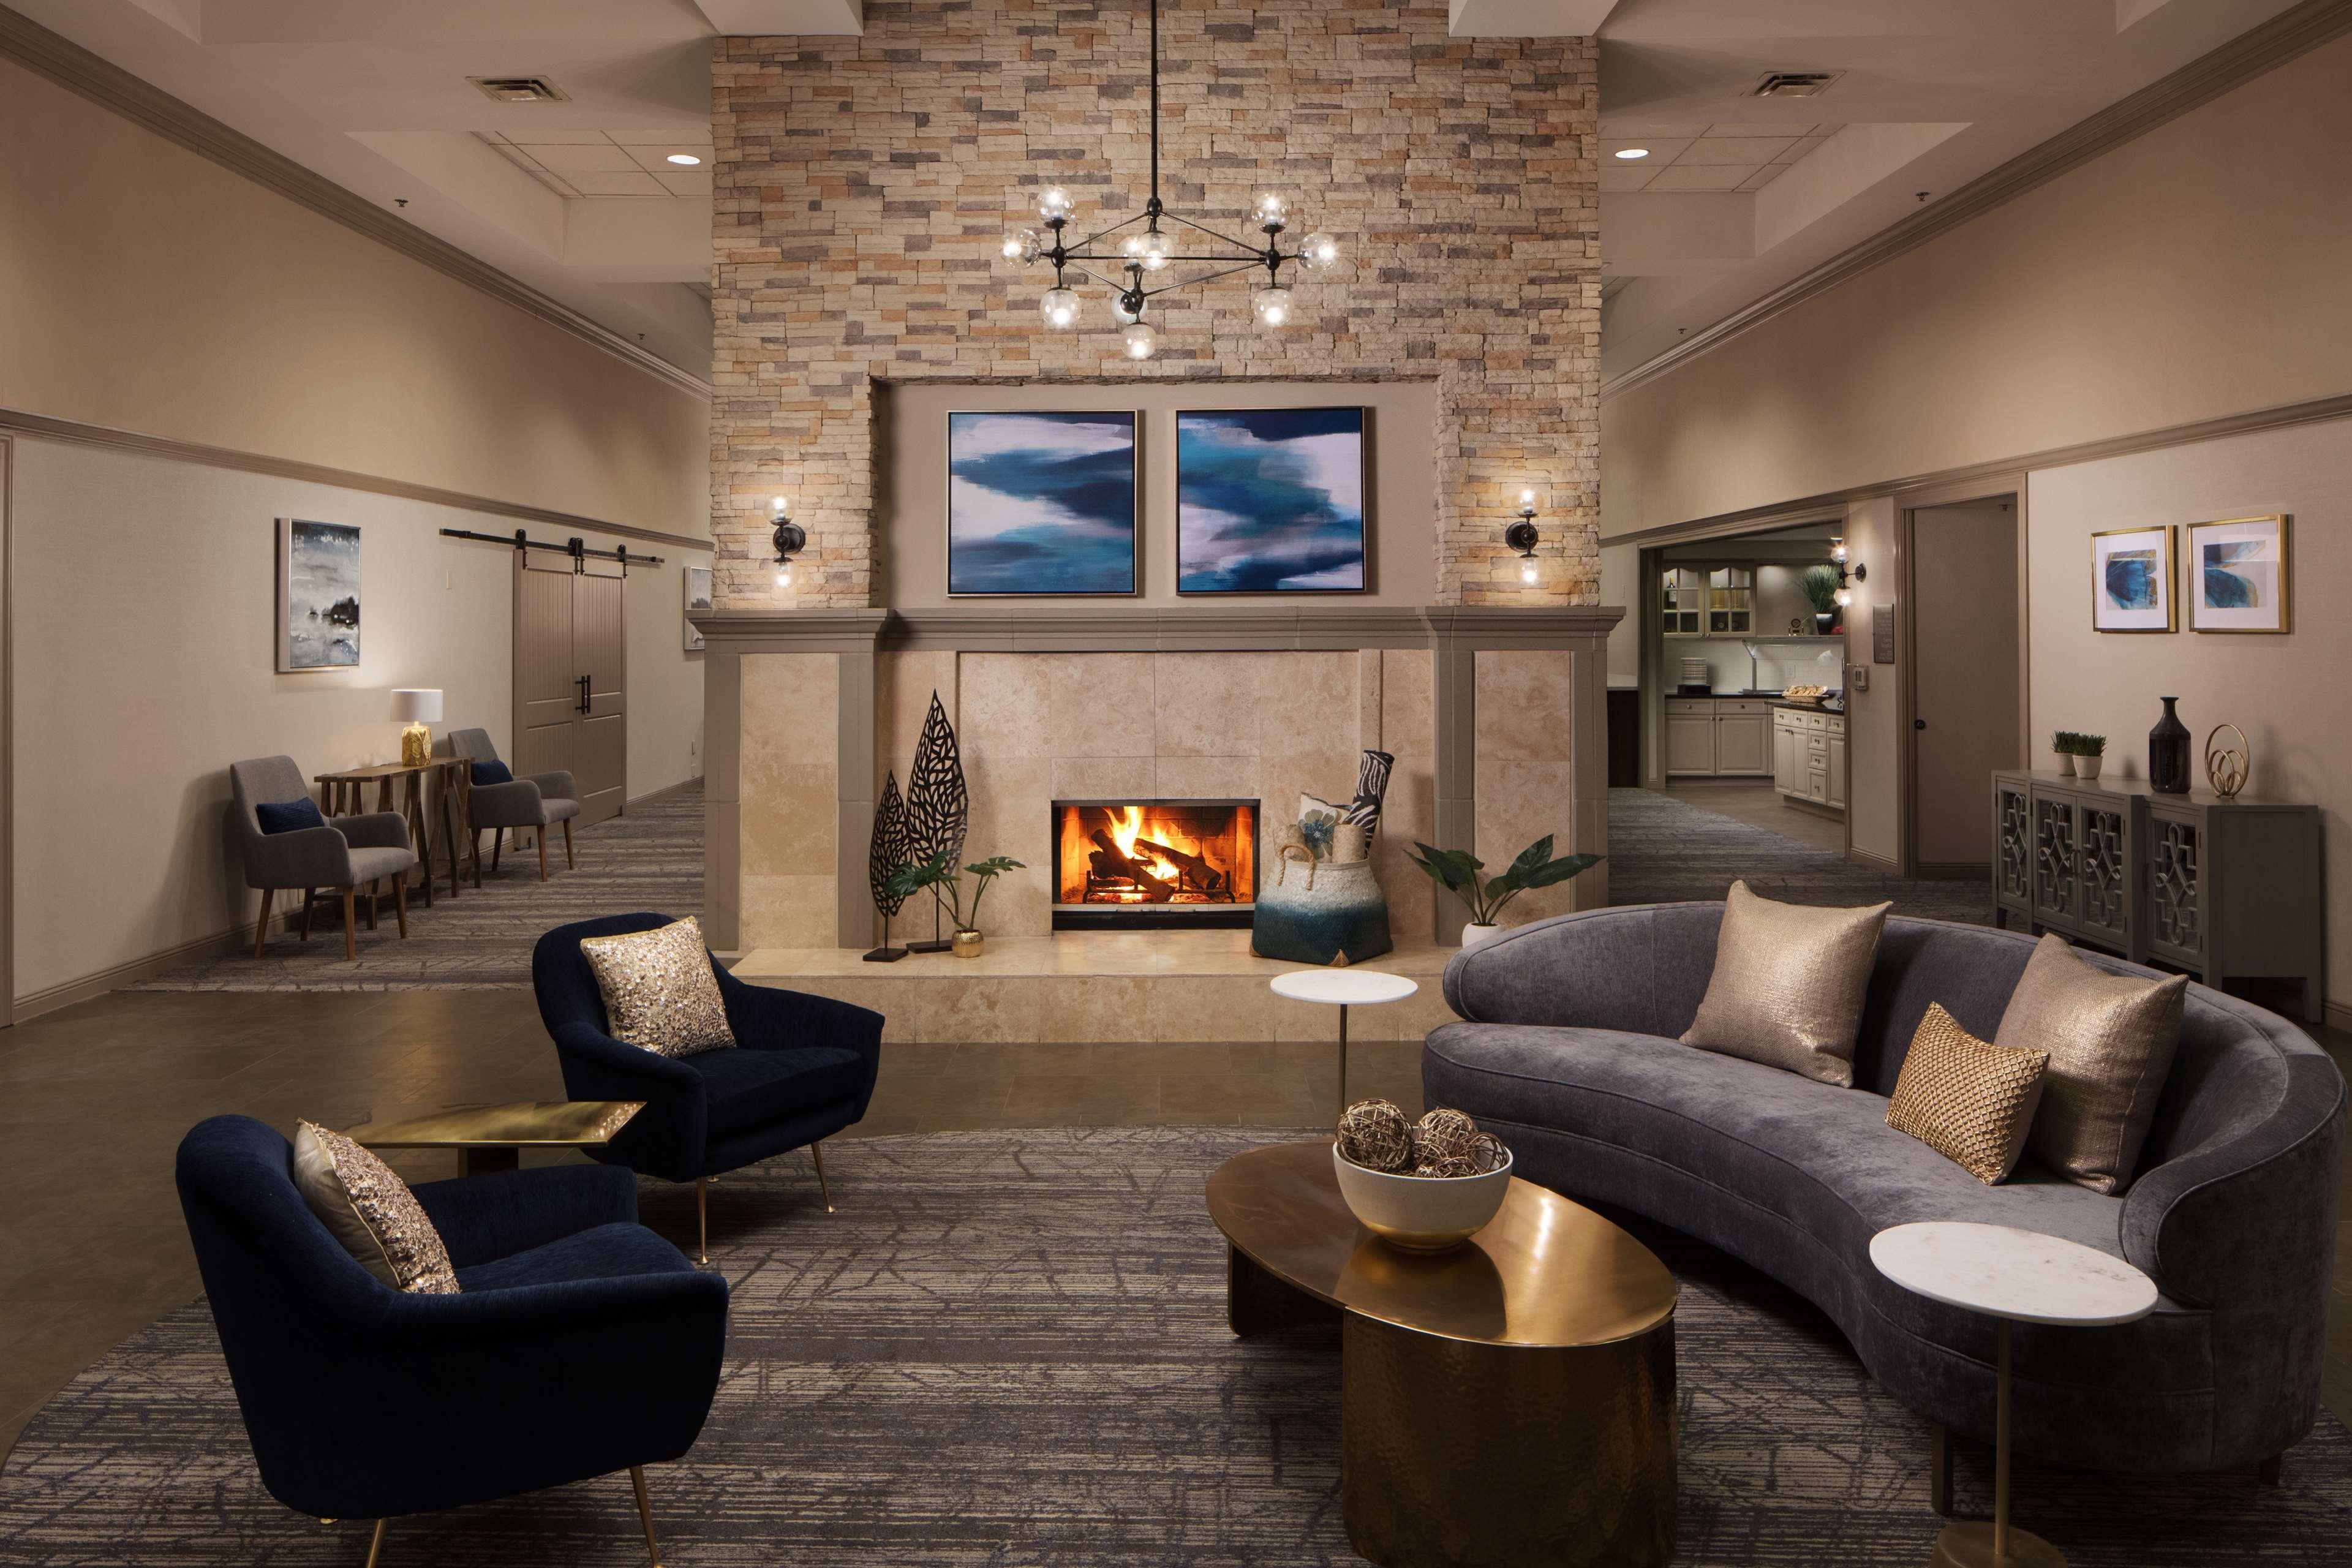 Homewood Suites by Hilton Lubbock image 5